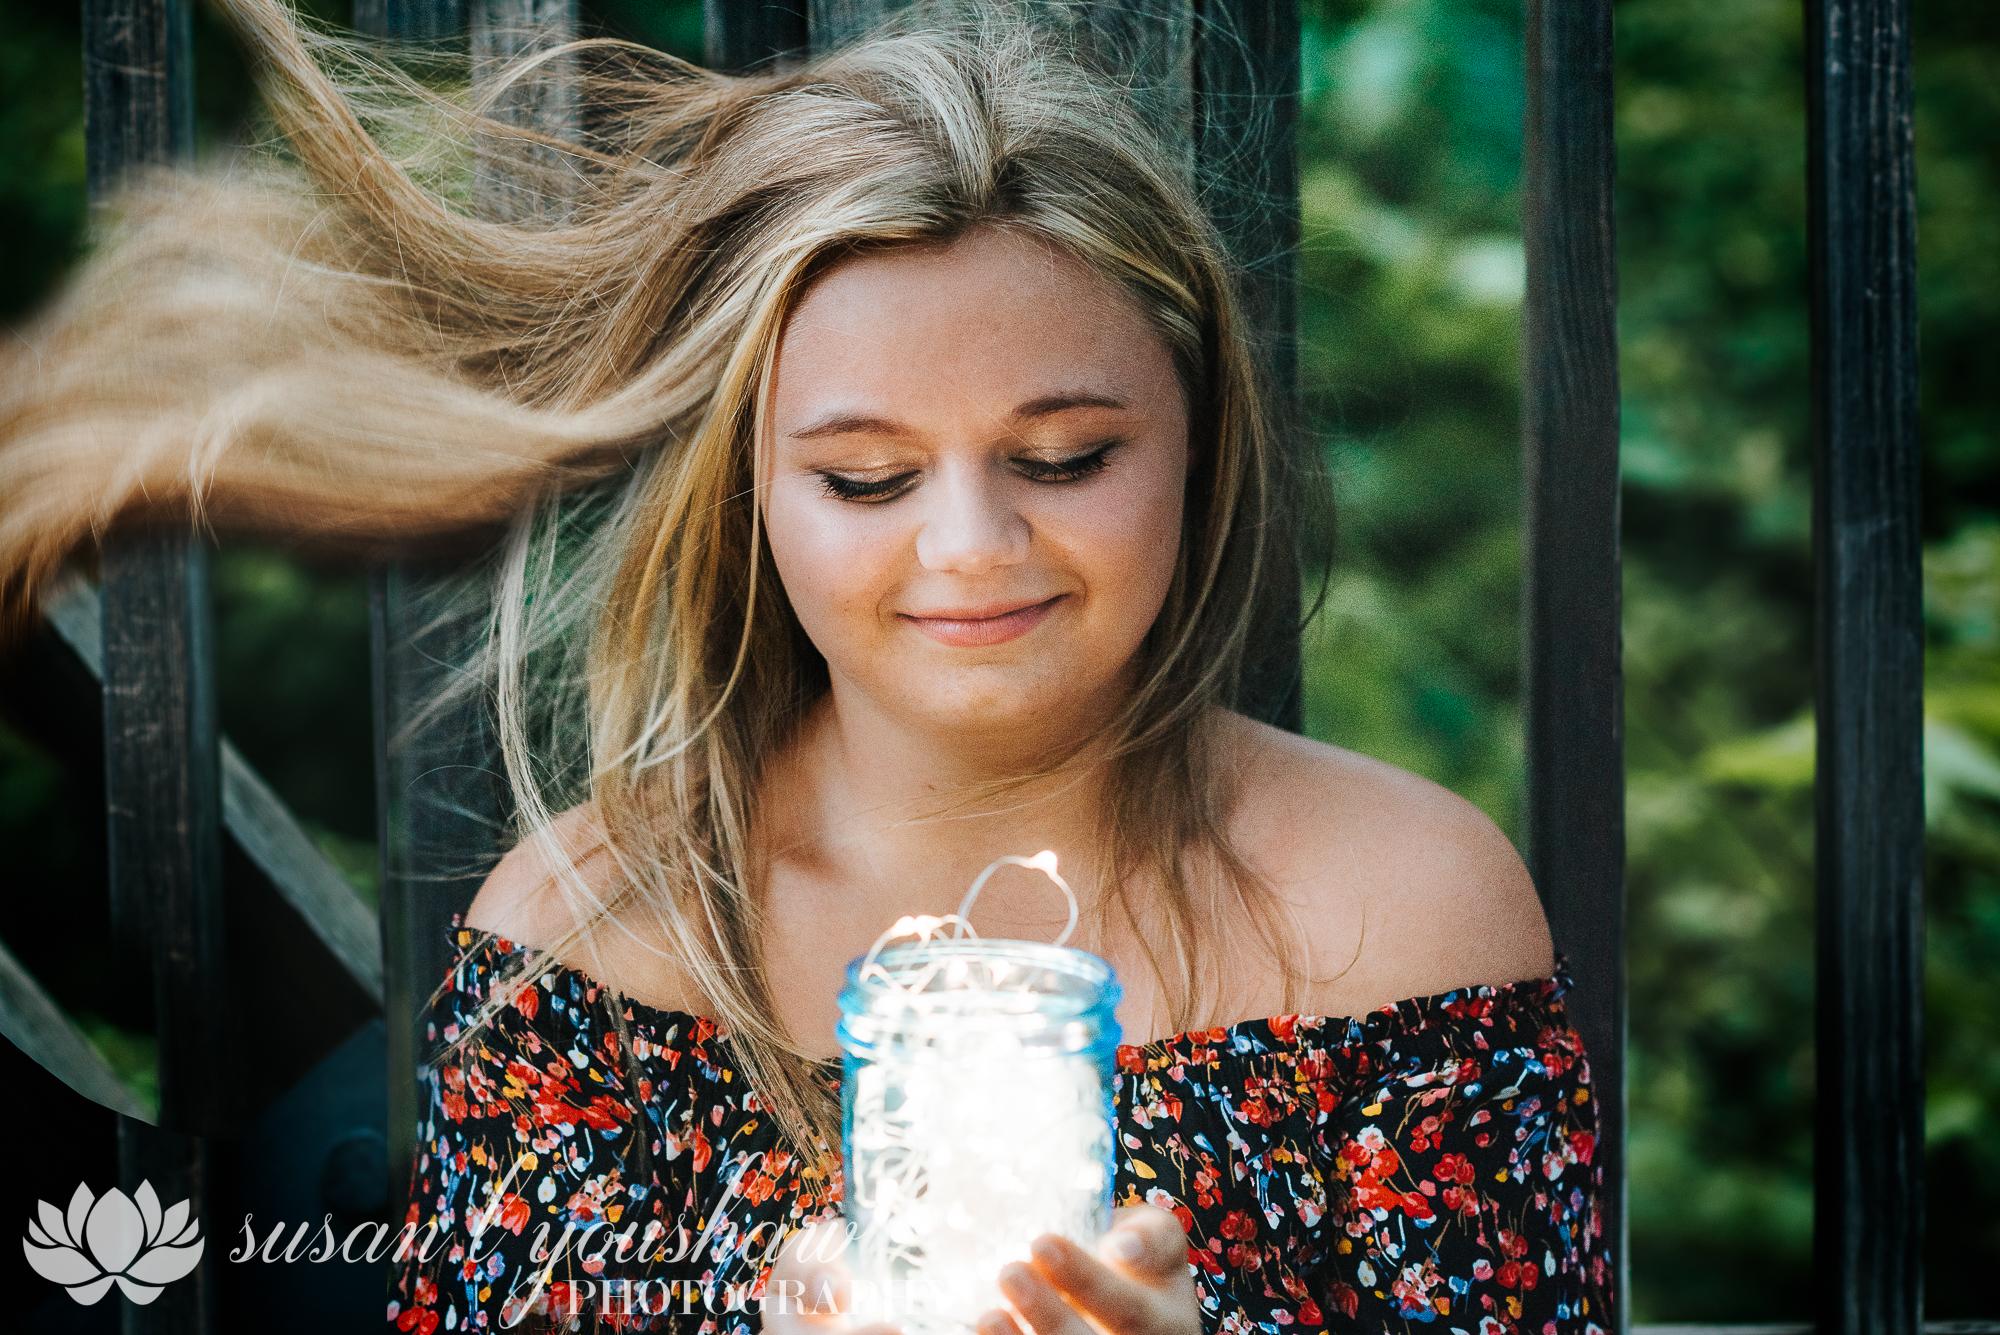 BLOG Karrie Bower 08-16-2018 SLY Photography LLC-12.jpg